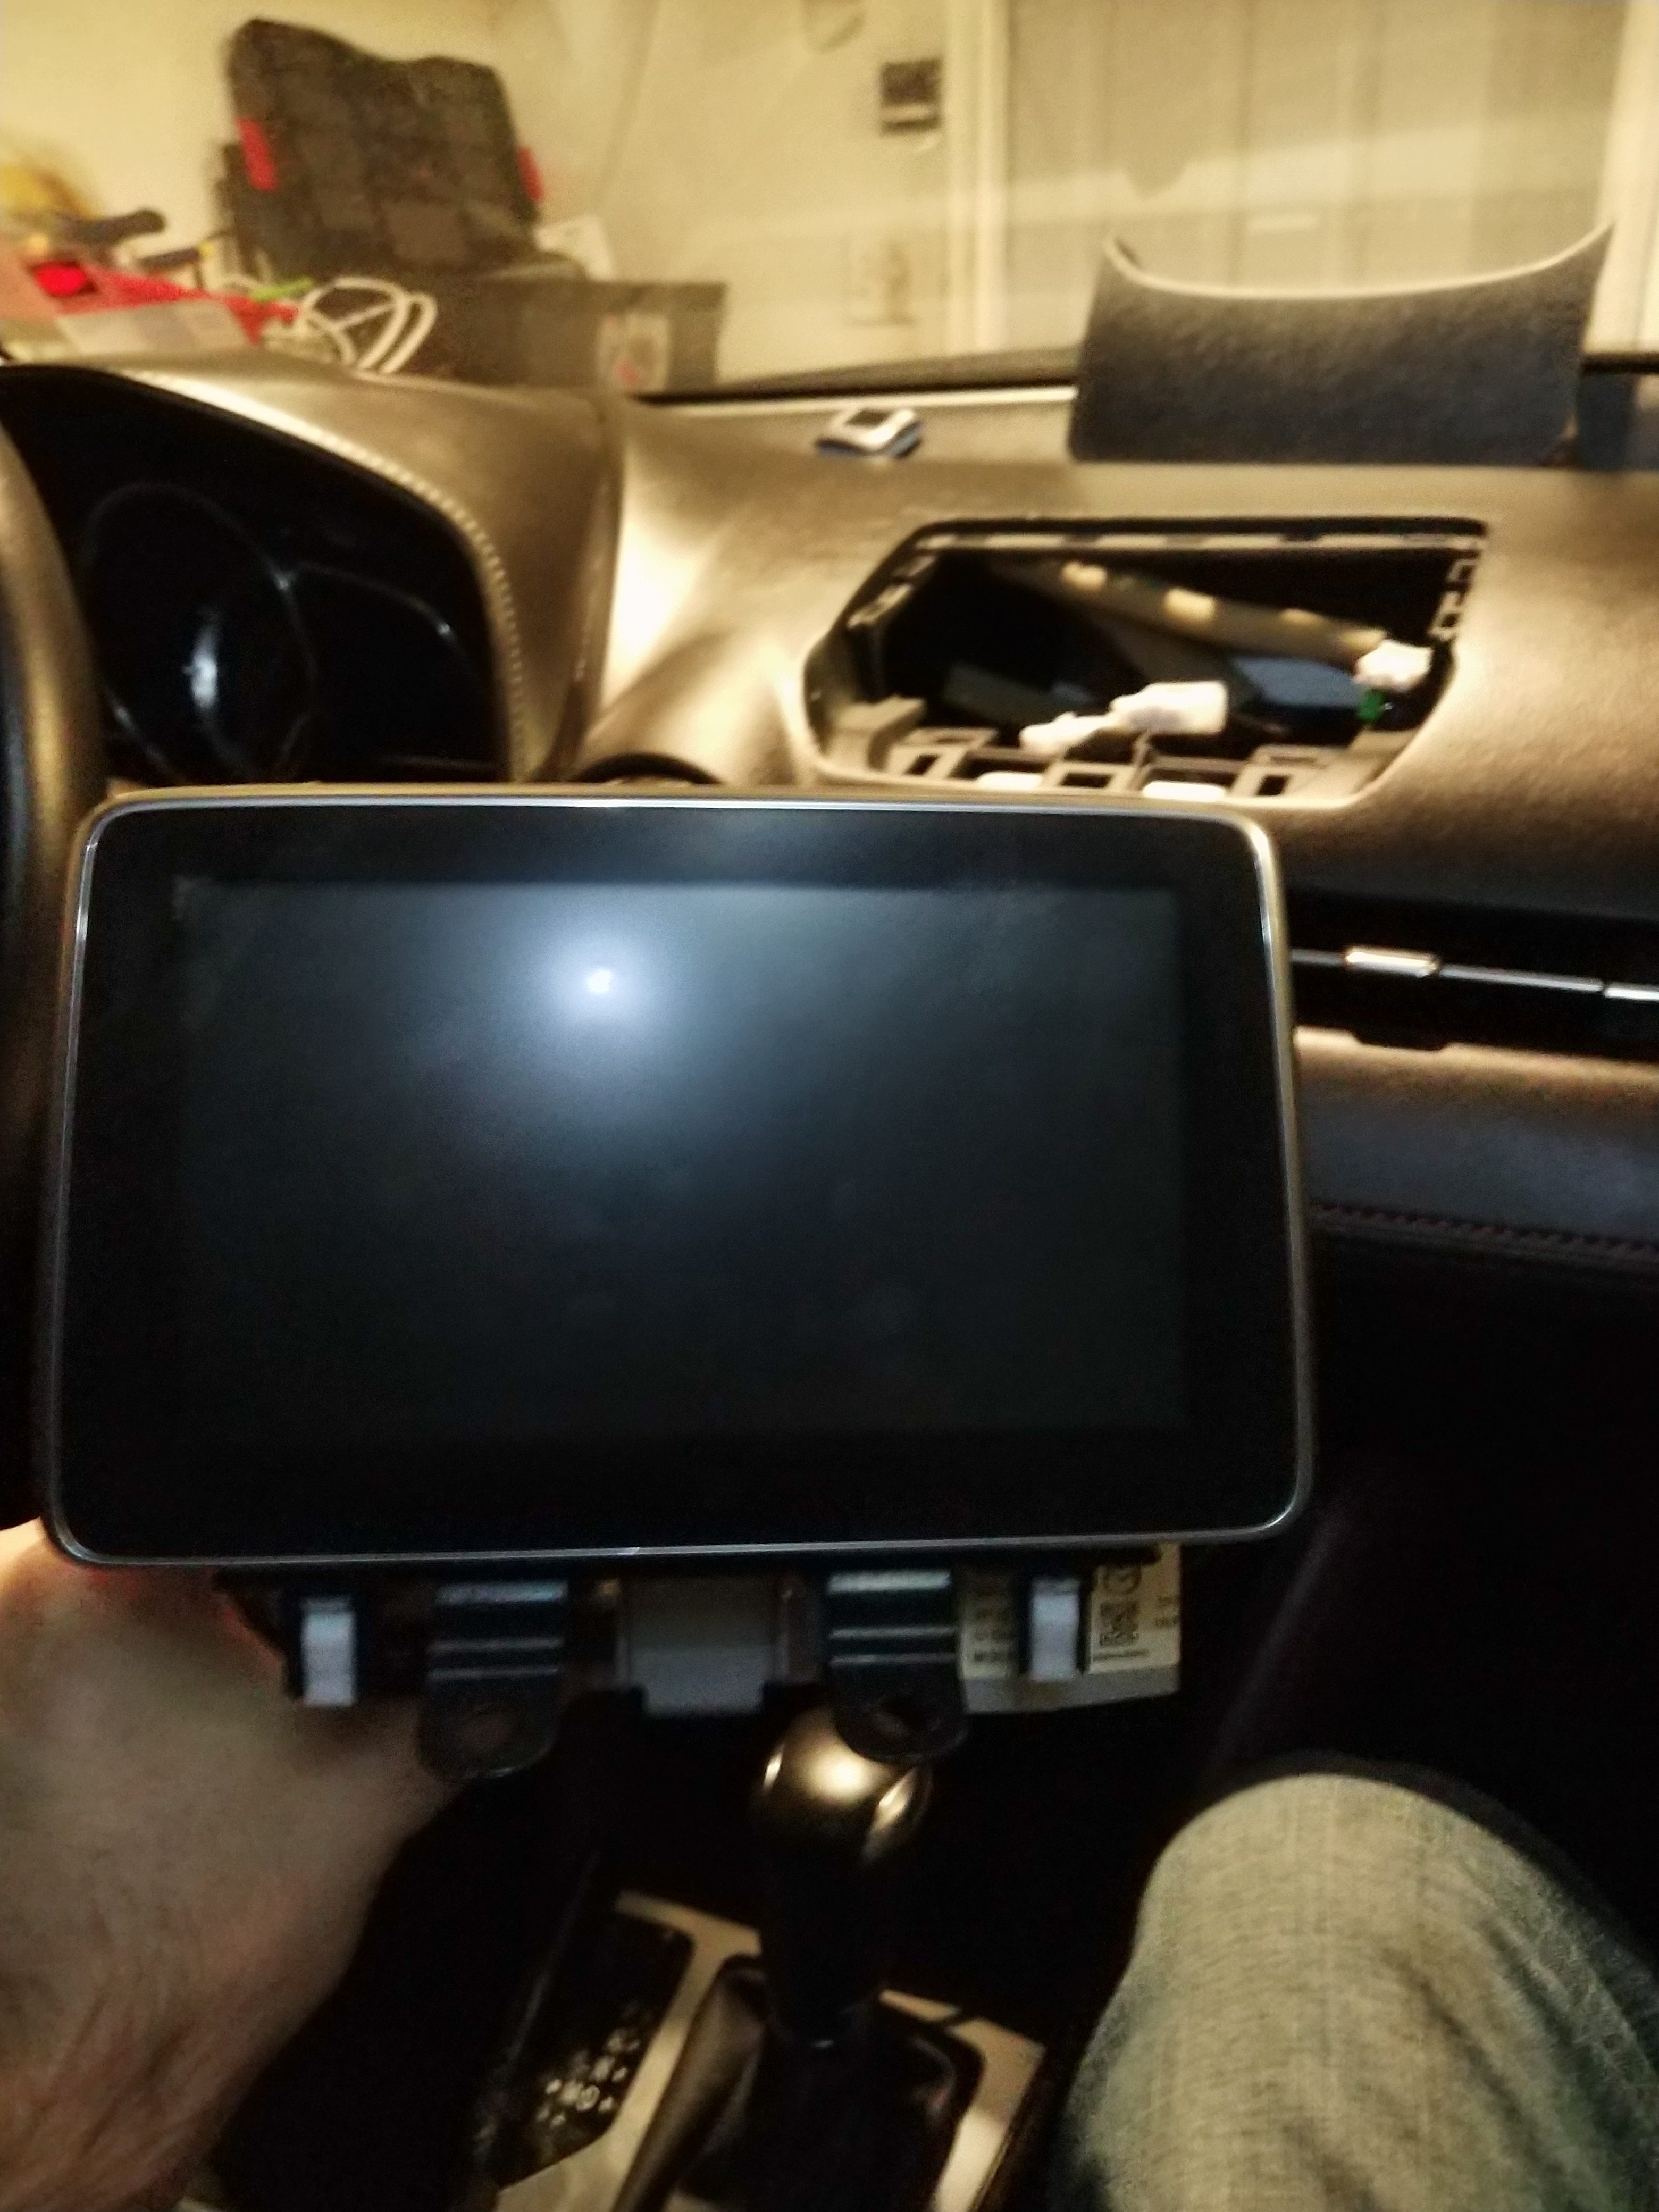 Installing Android Auto / Apple Carplay retrofit in Mazda CX9